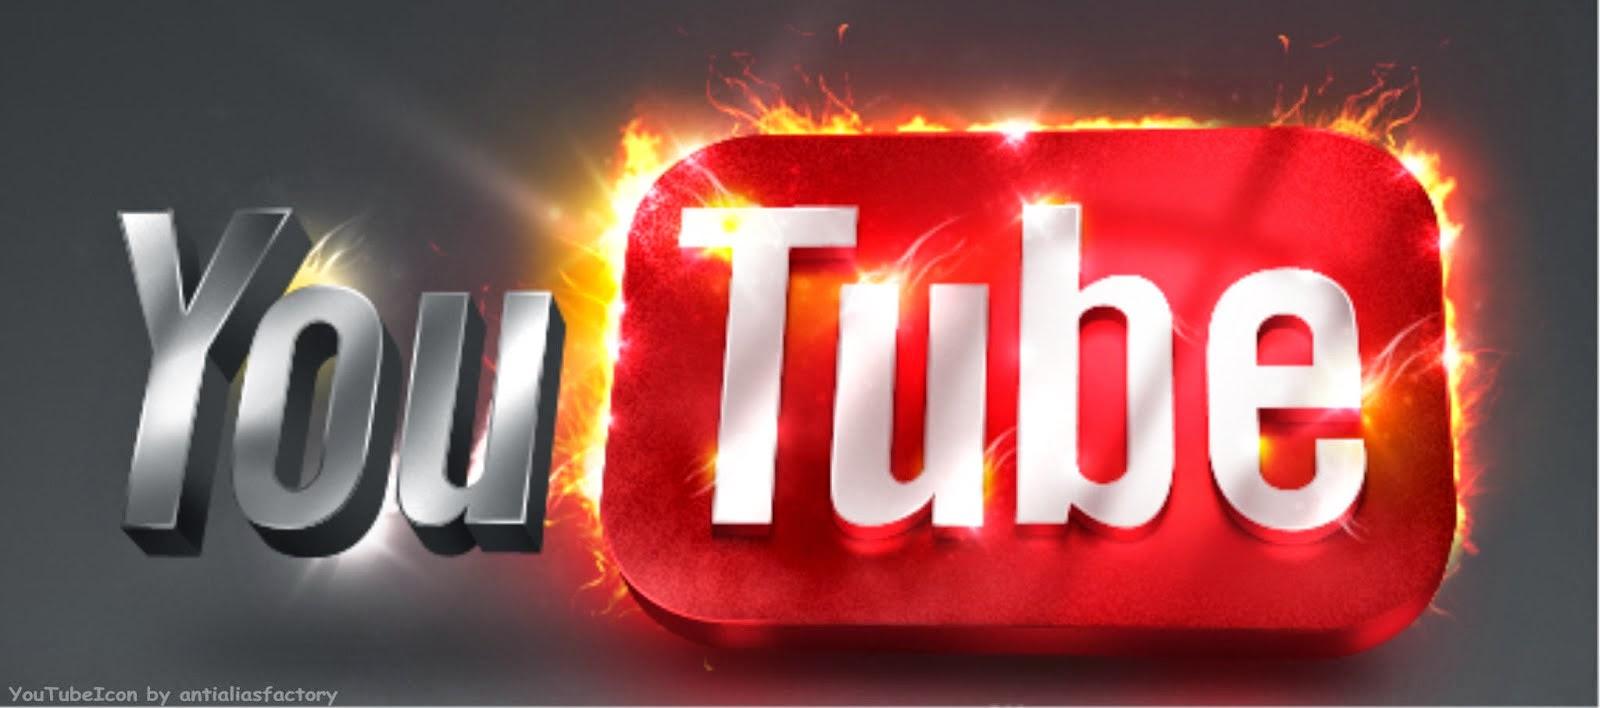 Assista meus videos !!!